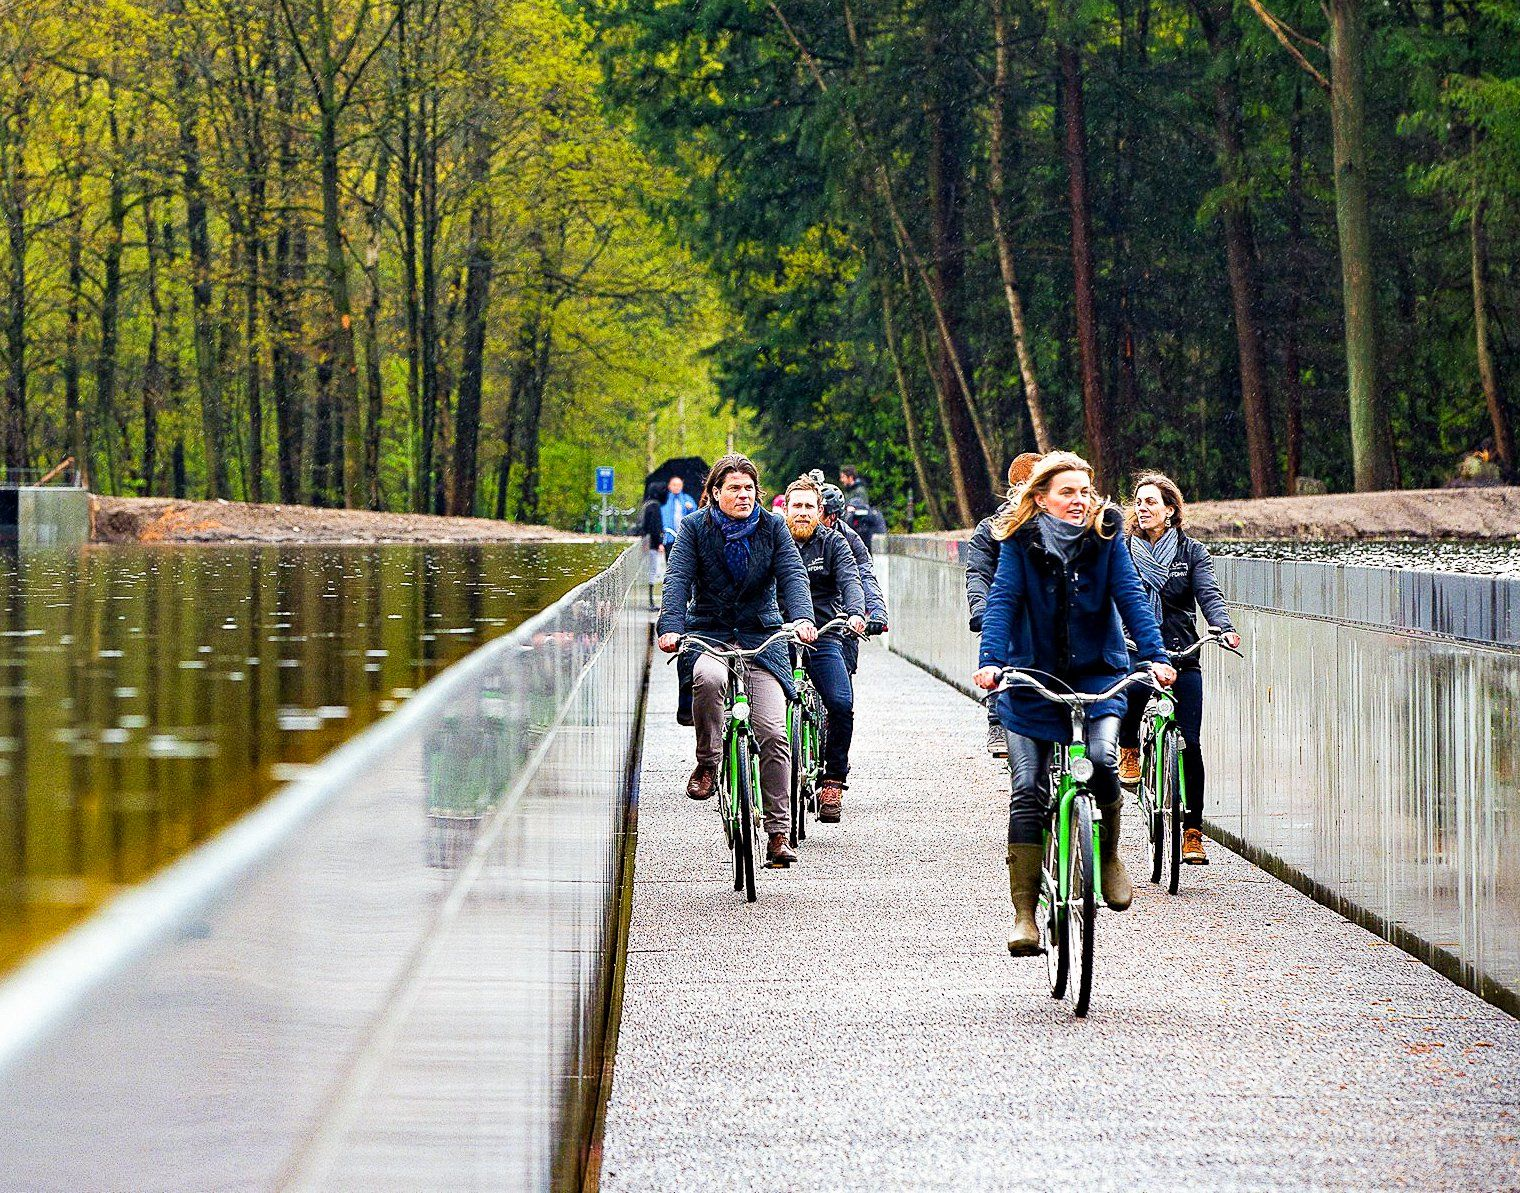 Cycle Through Belgian Waters On This Stunning Bike Path Bike